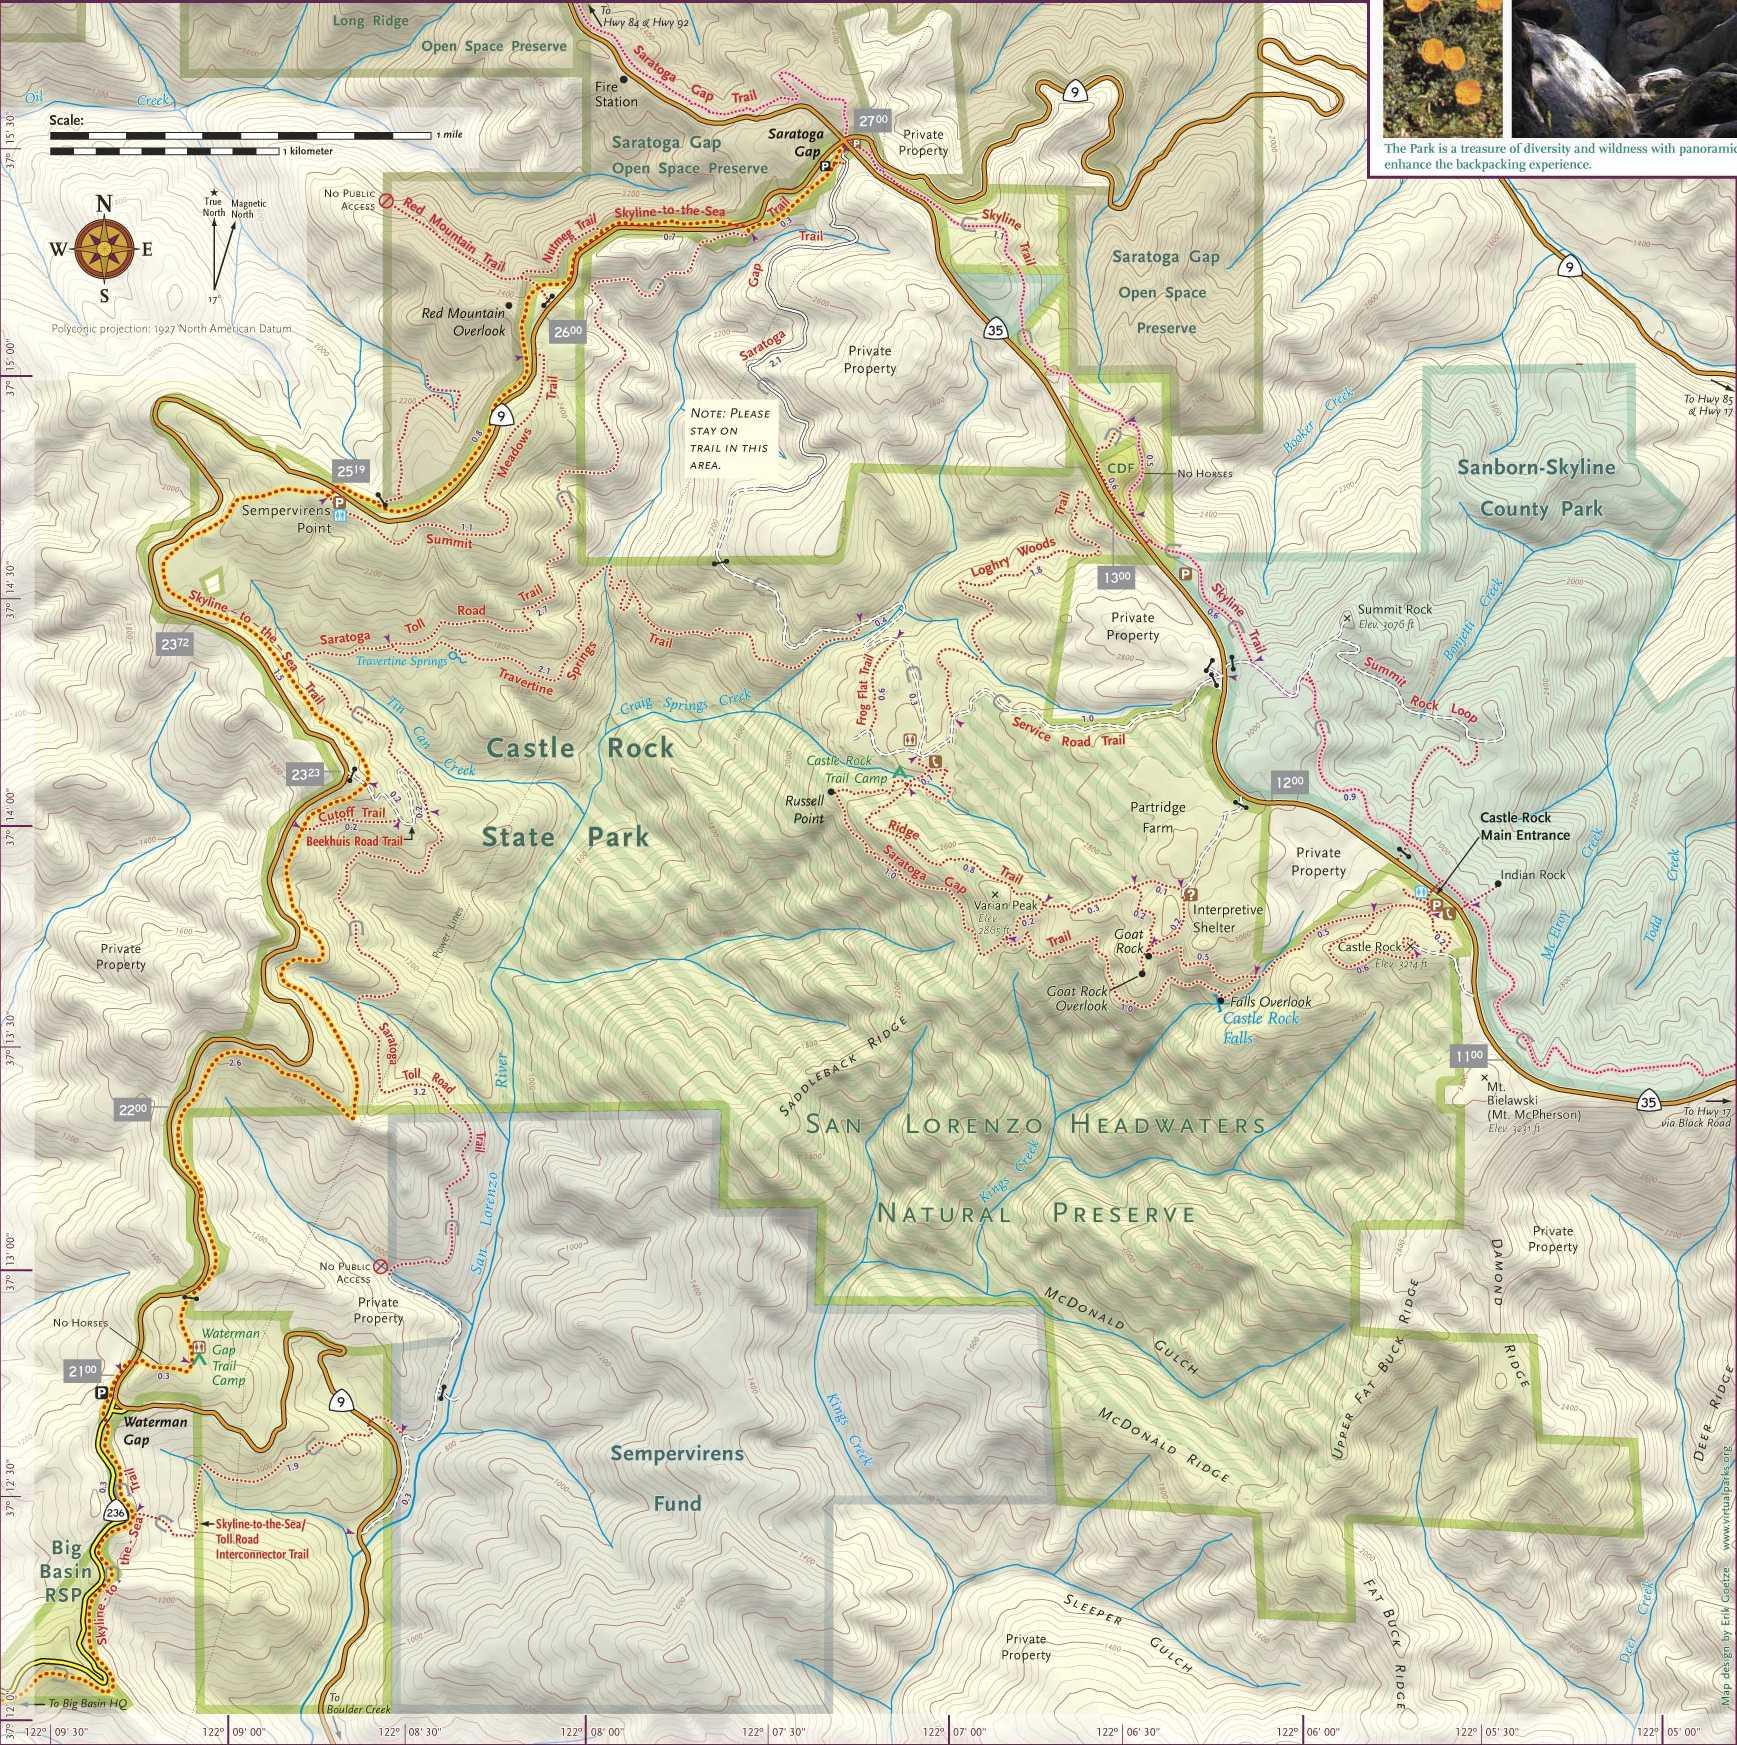 Santa Teresa California Map.Expertgps Calibrated Maps